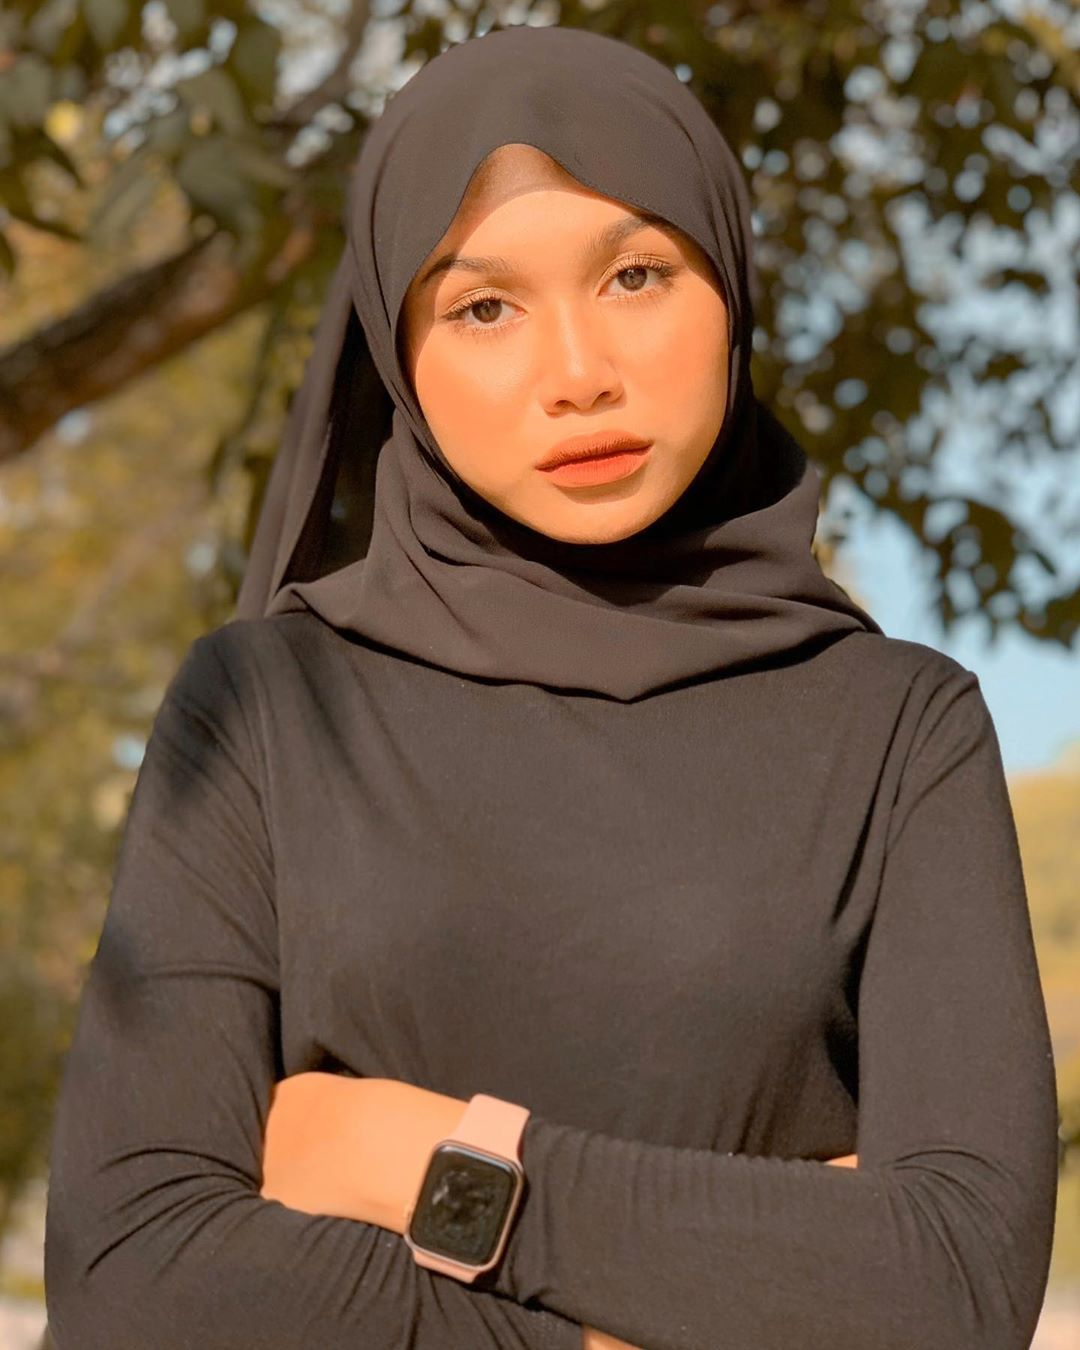 PRETTY MUSLIMAH | Muslim girls, Girl hijab, Fashion